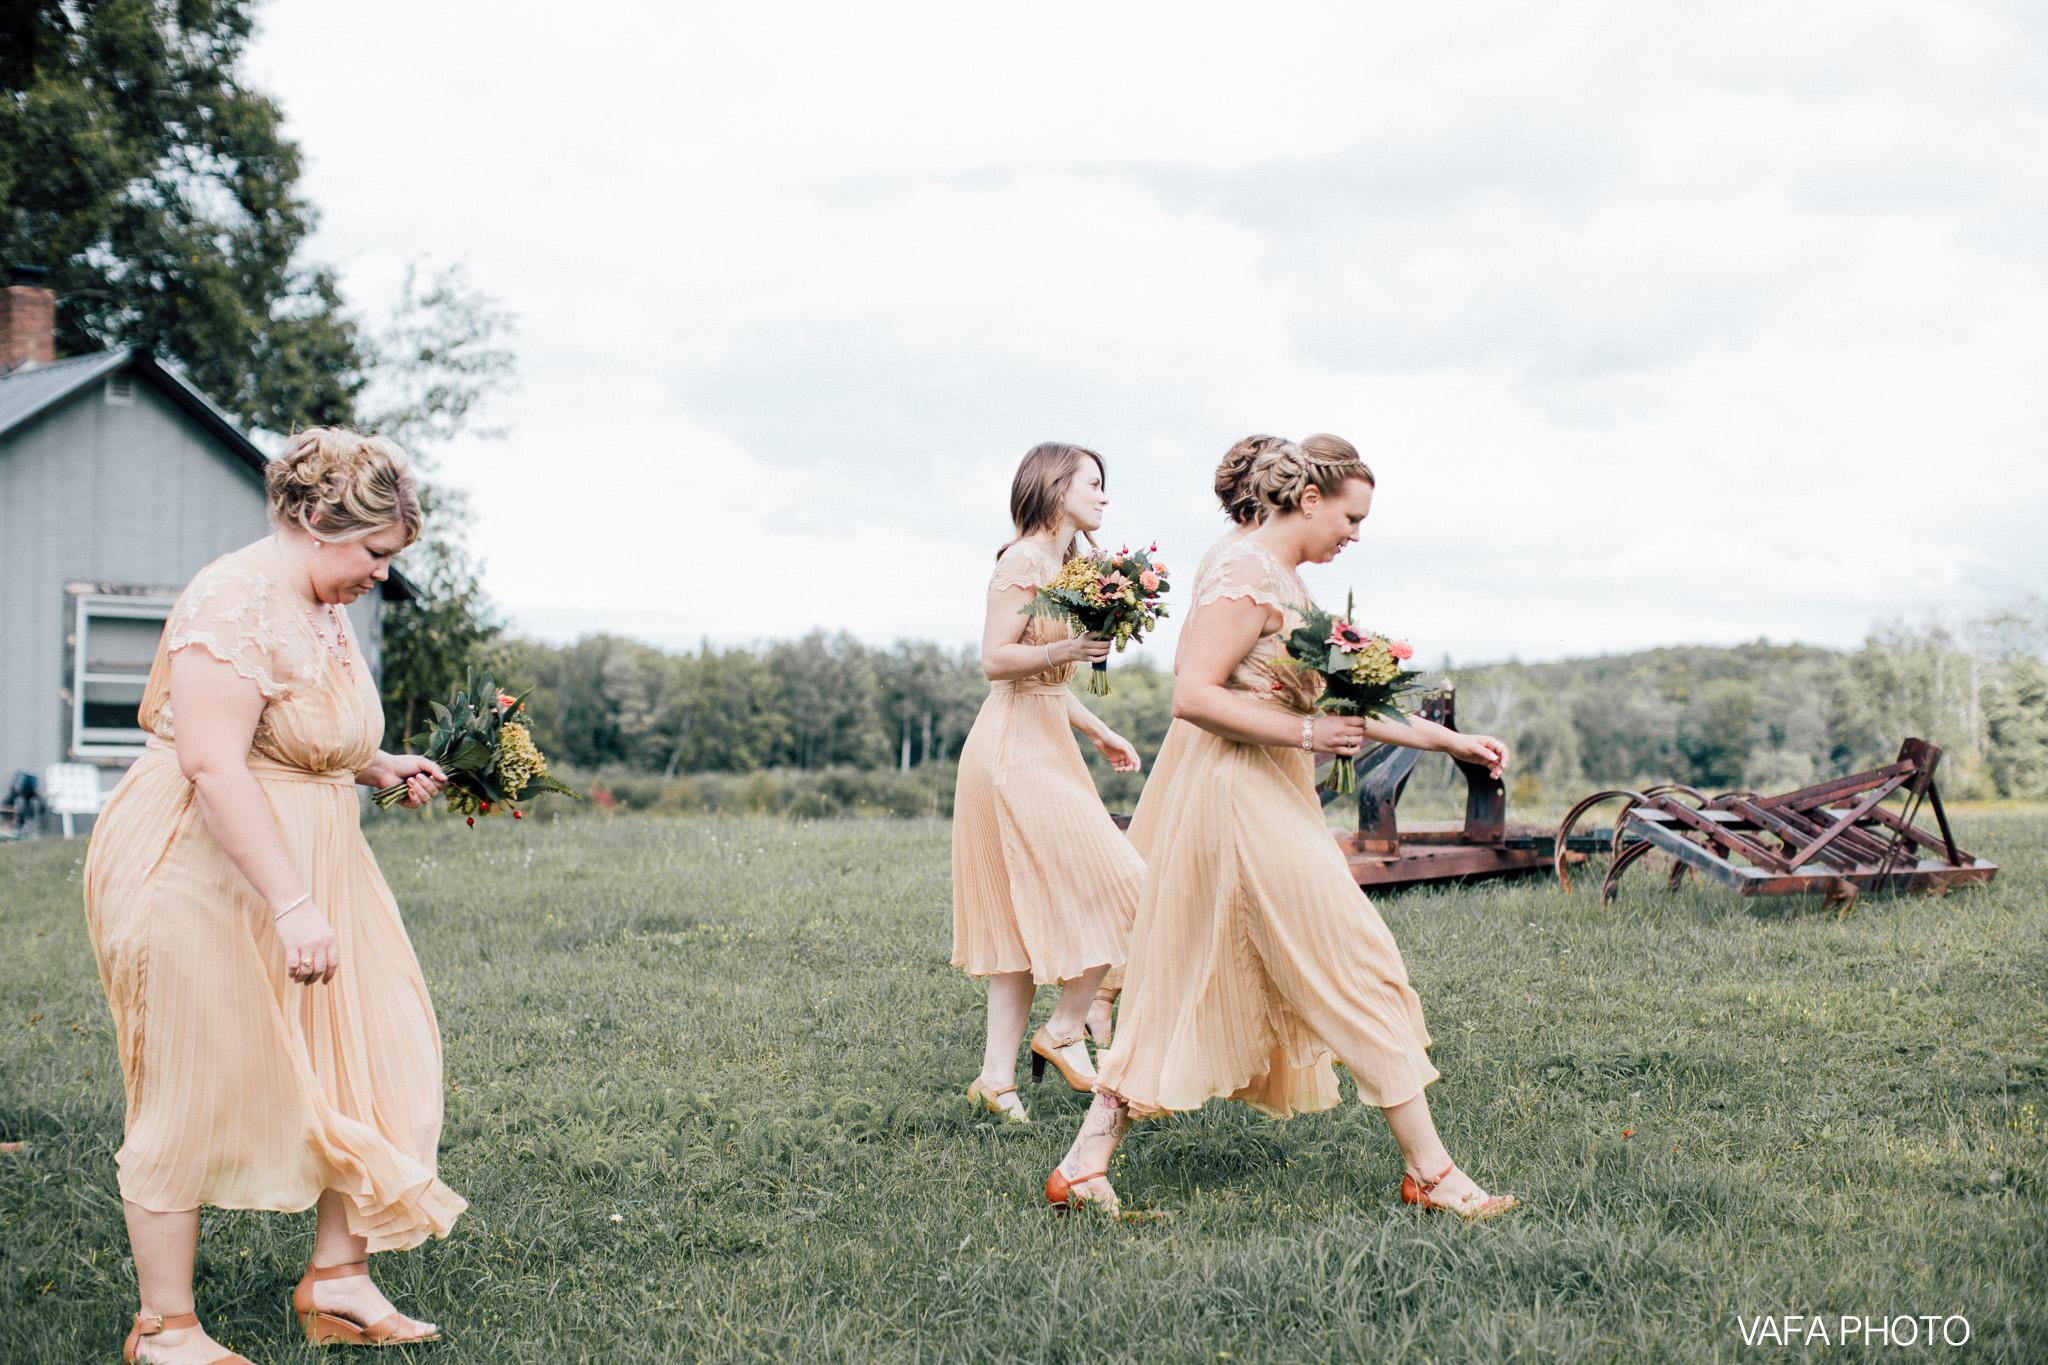 Belsolda-Farm-Wedding-Christy-Eric-Vafa-Photo-221.jpg